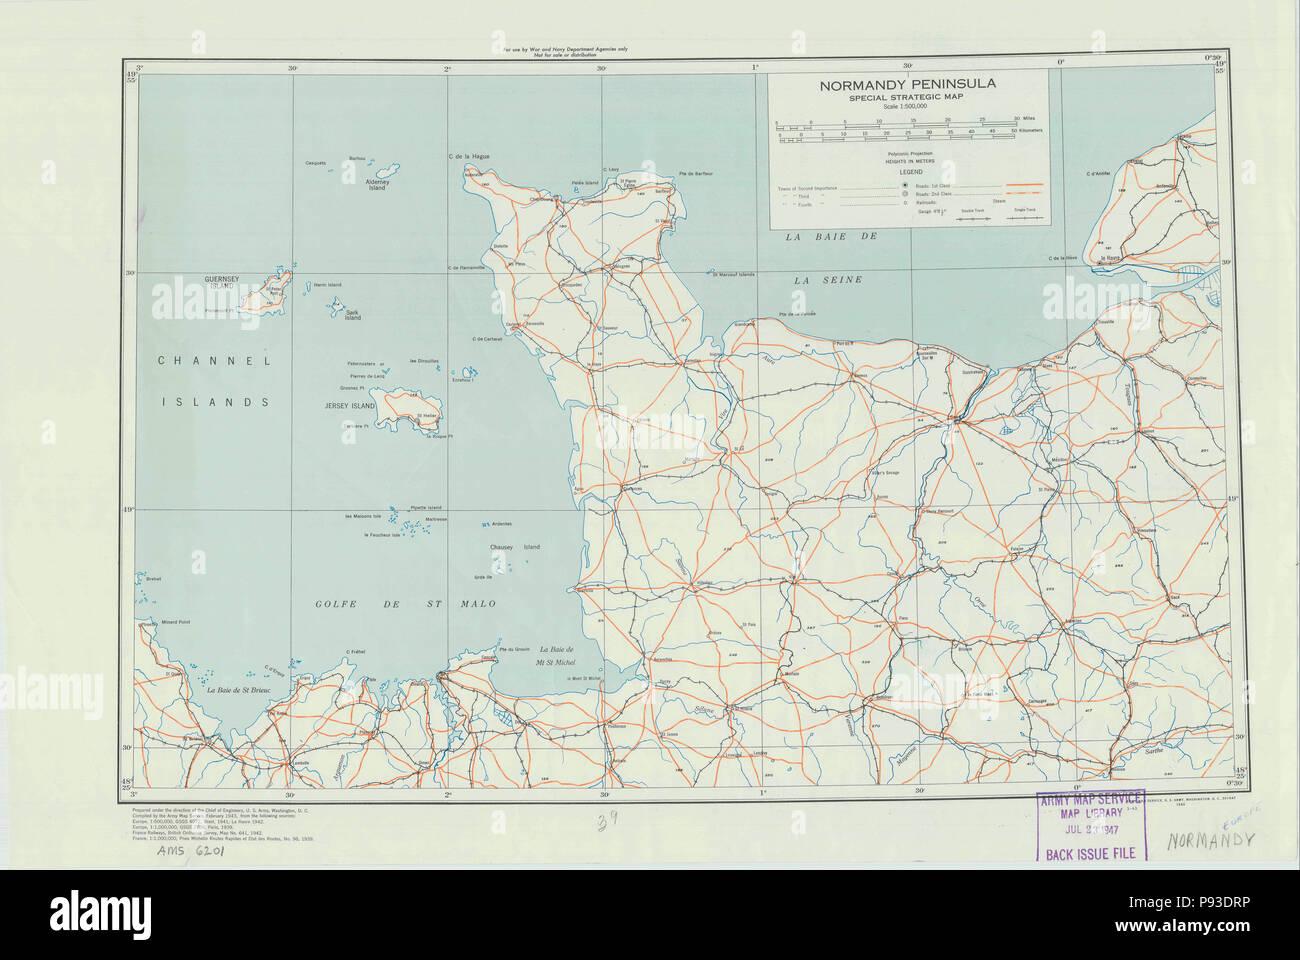 Vintage U S Map Stock Photos & Vintage U S Map Stock Images - Alamy